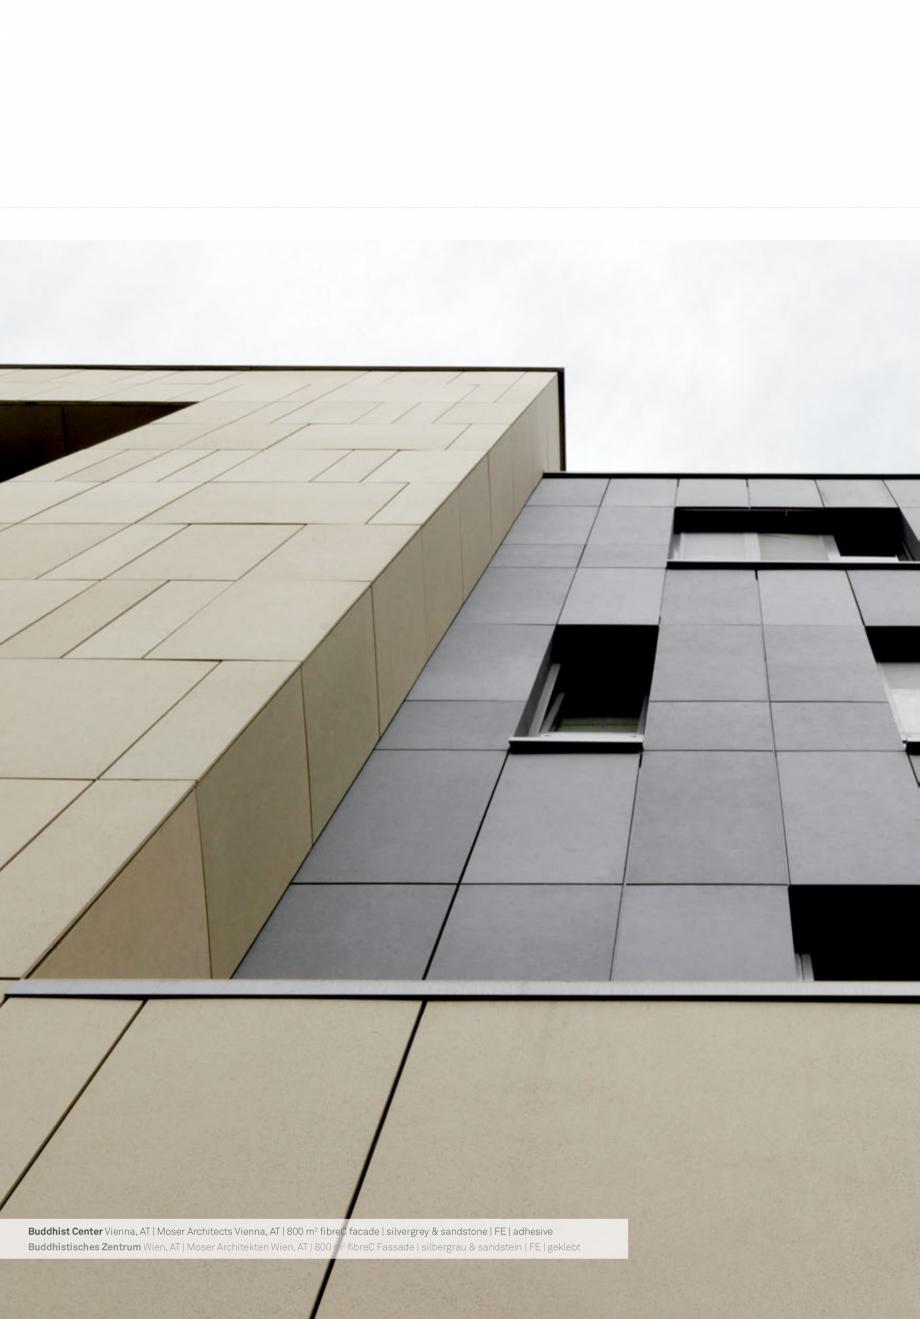 Pagina 10 - Panouri din beton aparent RIEDER Concrete Skin Lucrari, proiecte Engleza ch is typical...